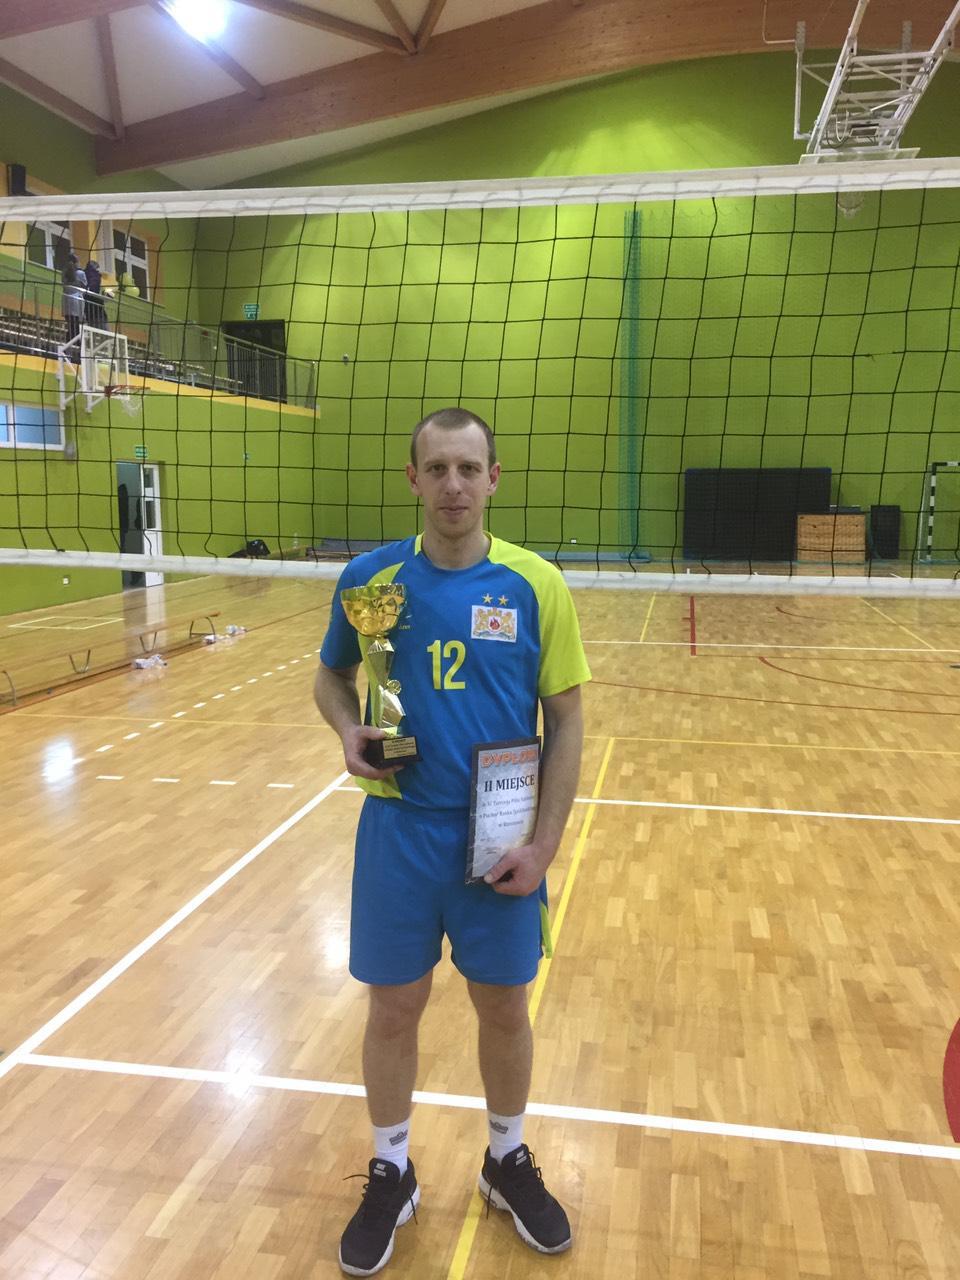 Кропивницький рятувальник очолив збiрну з волейболу (ФОТО)